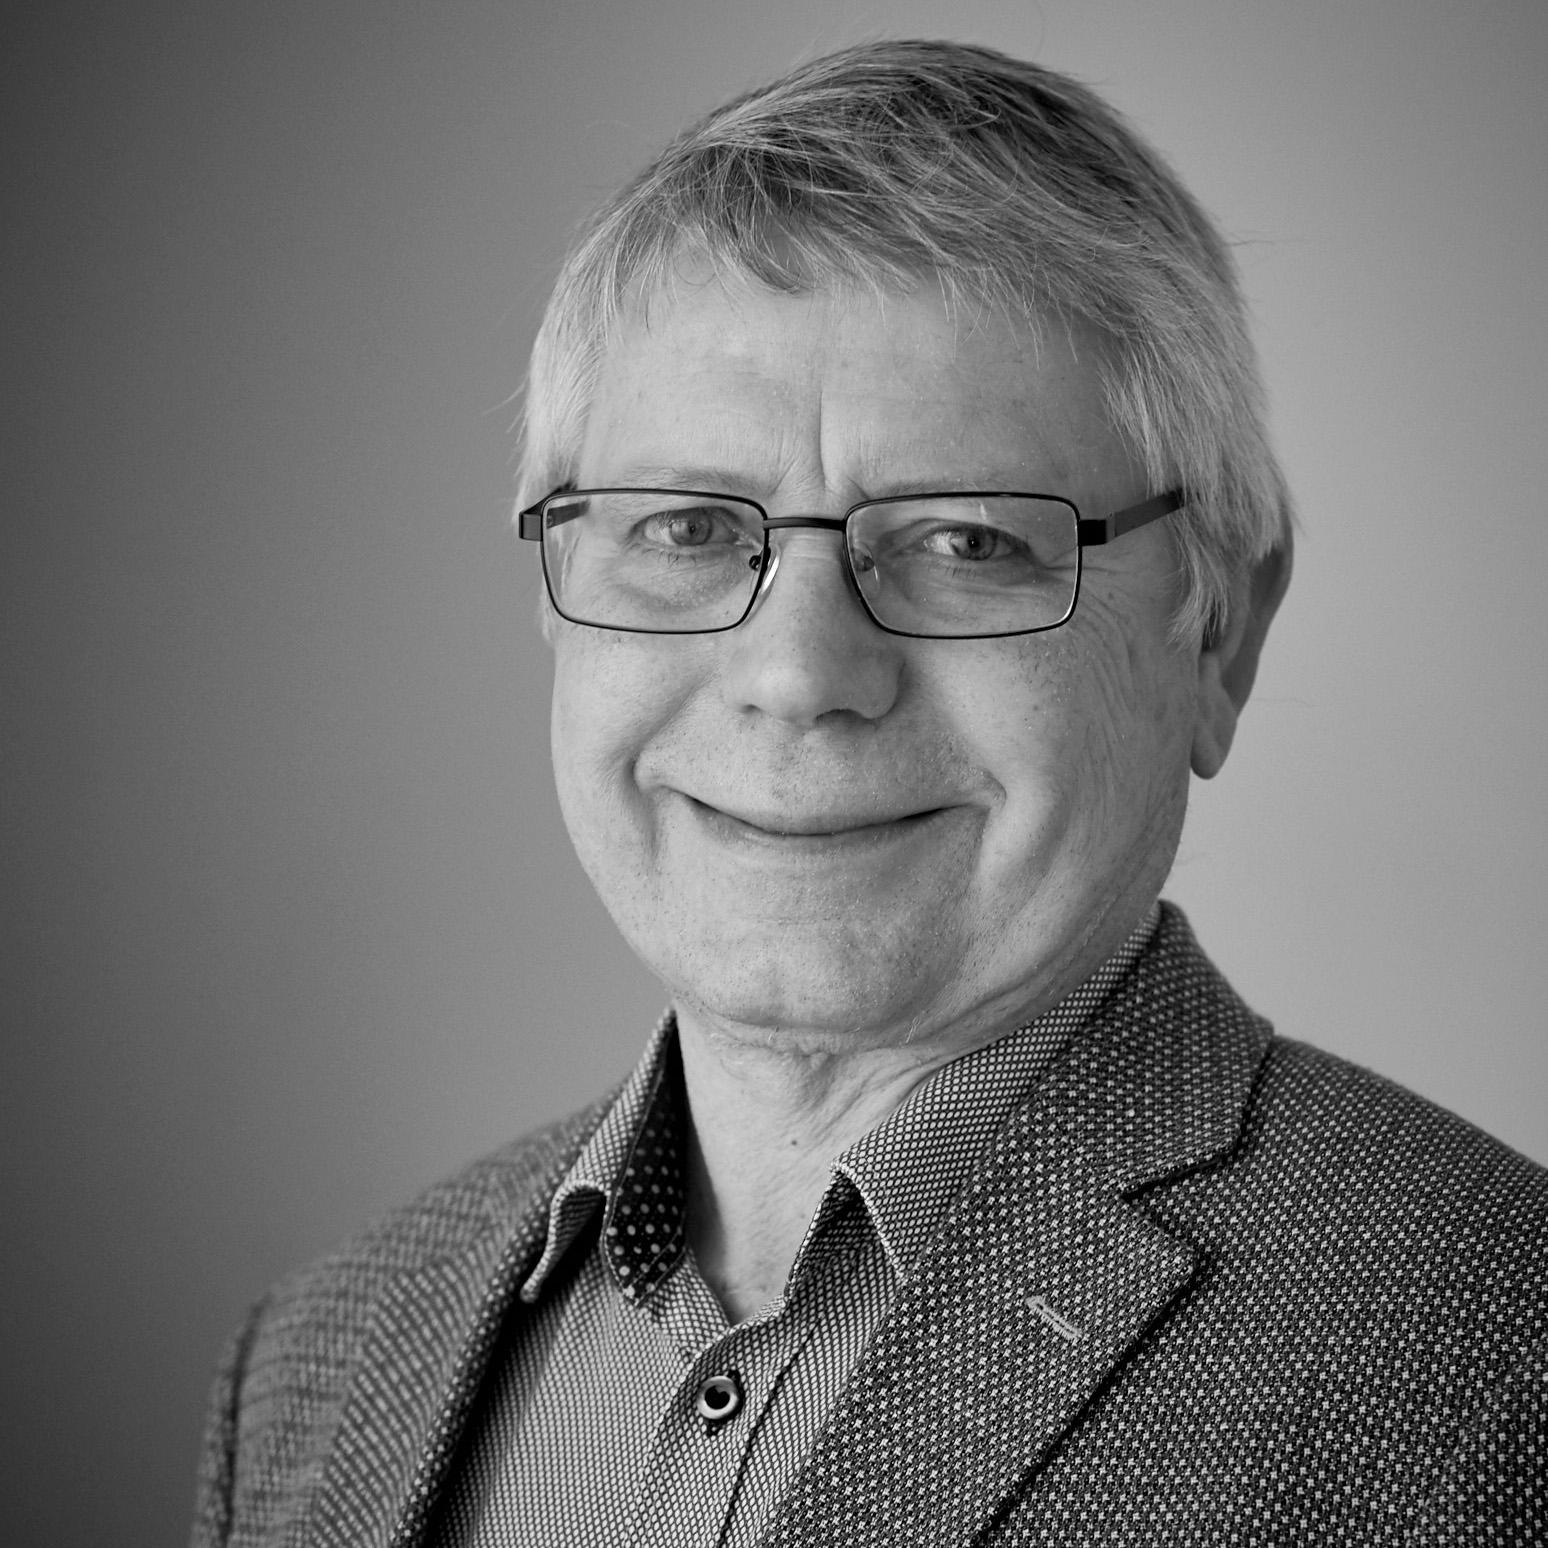 Peter Gøbel